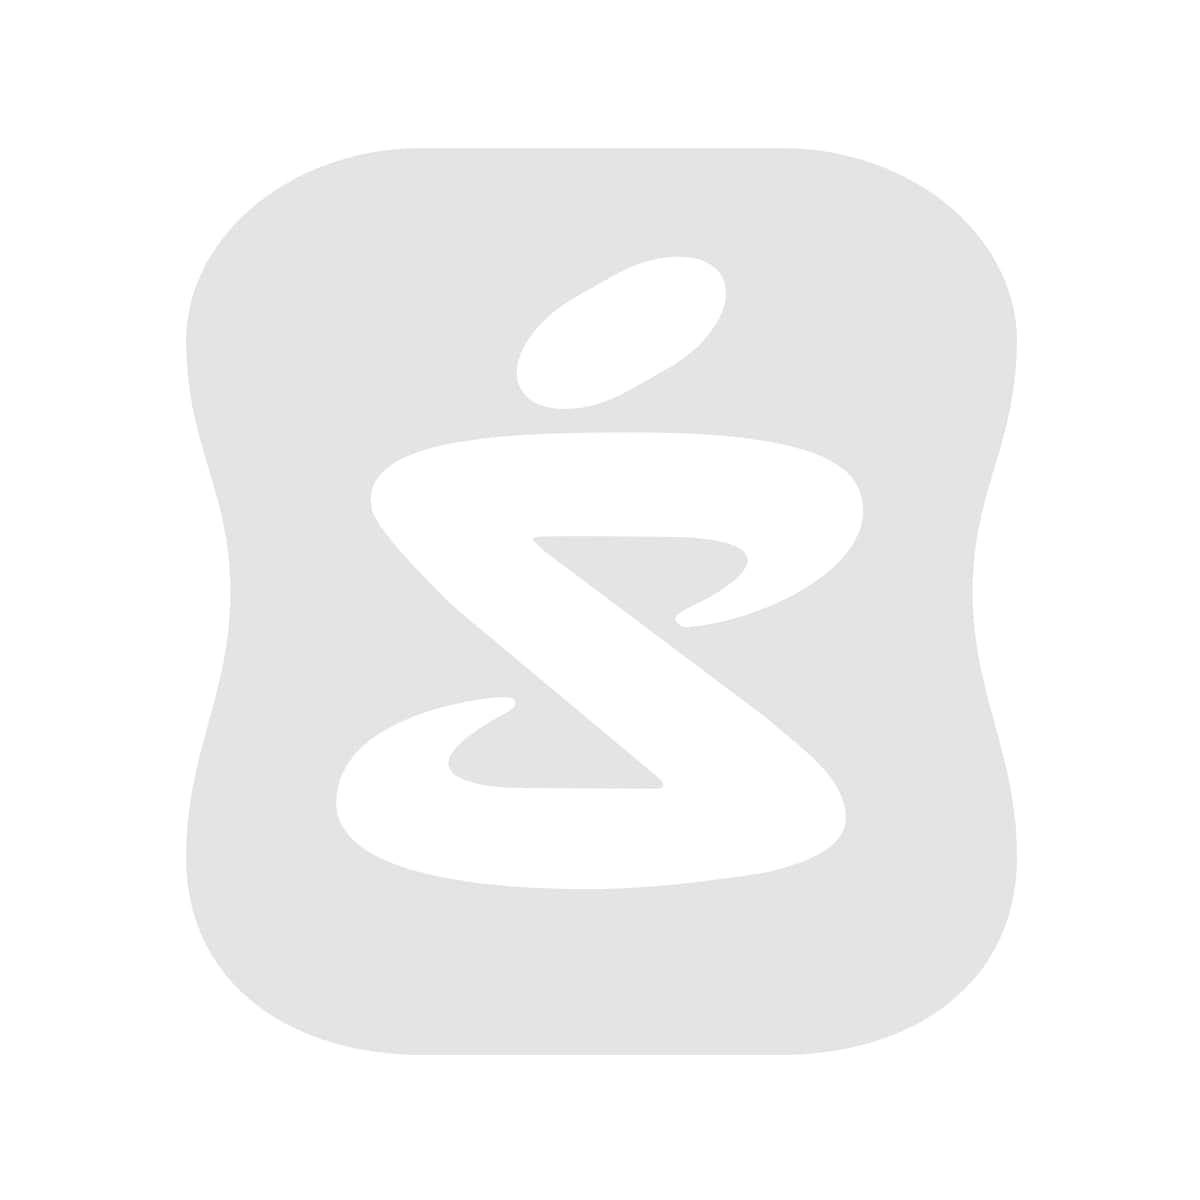 Nuxe Insta-Masque Exfoliant + Unifiant